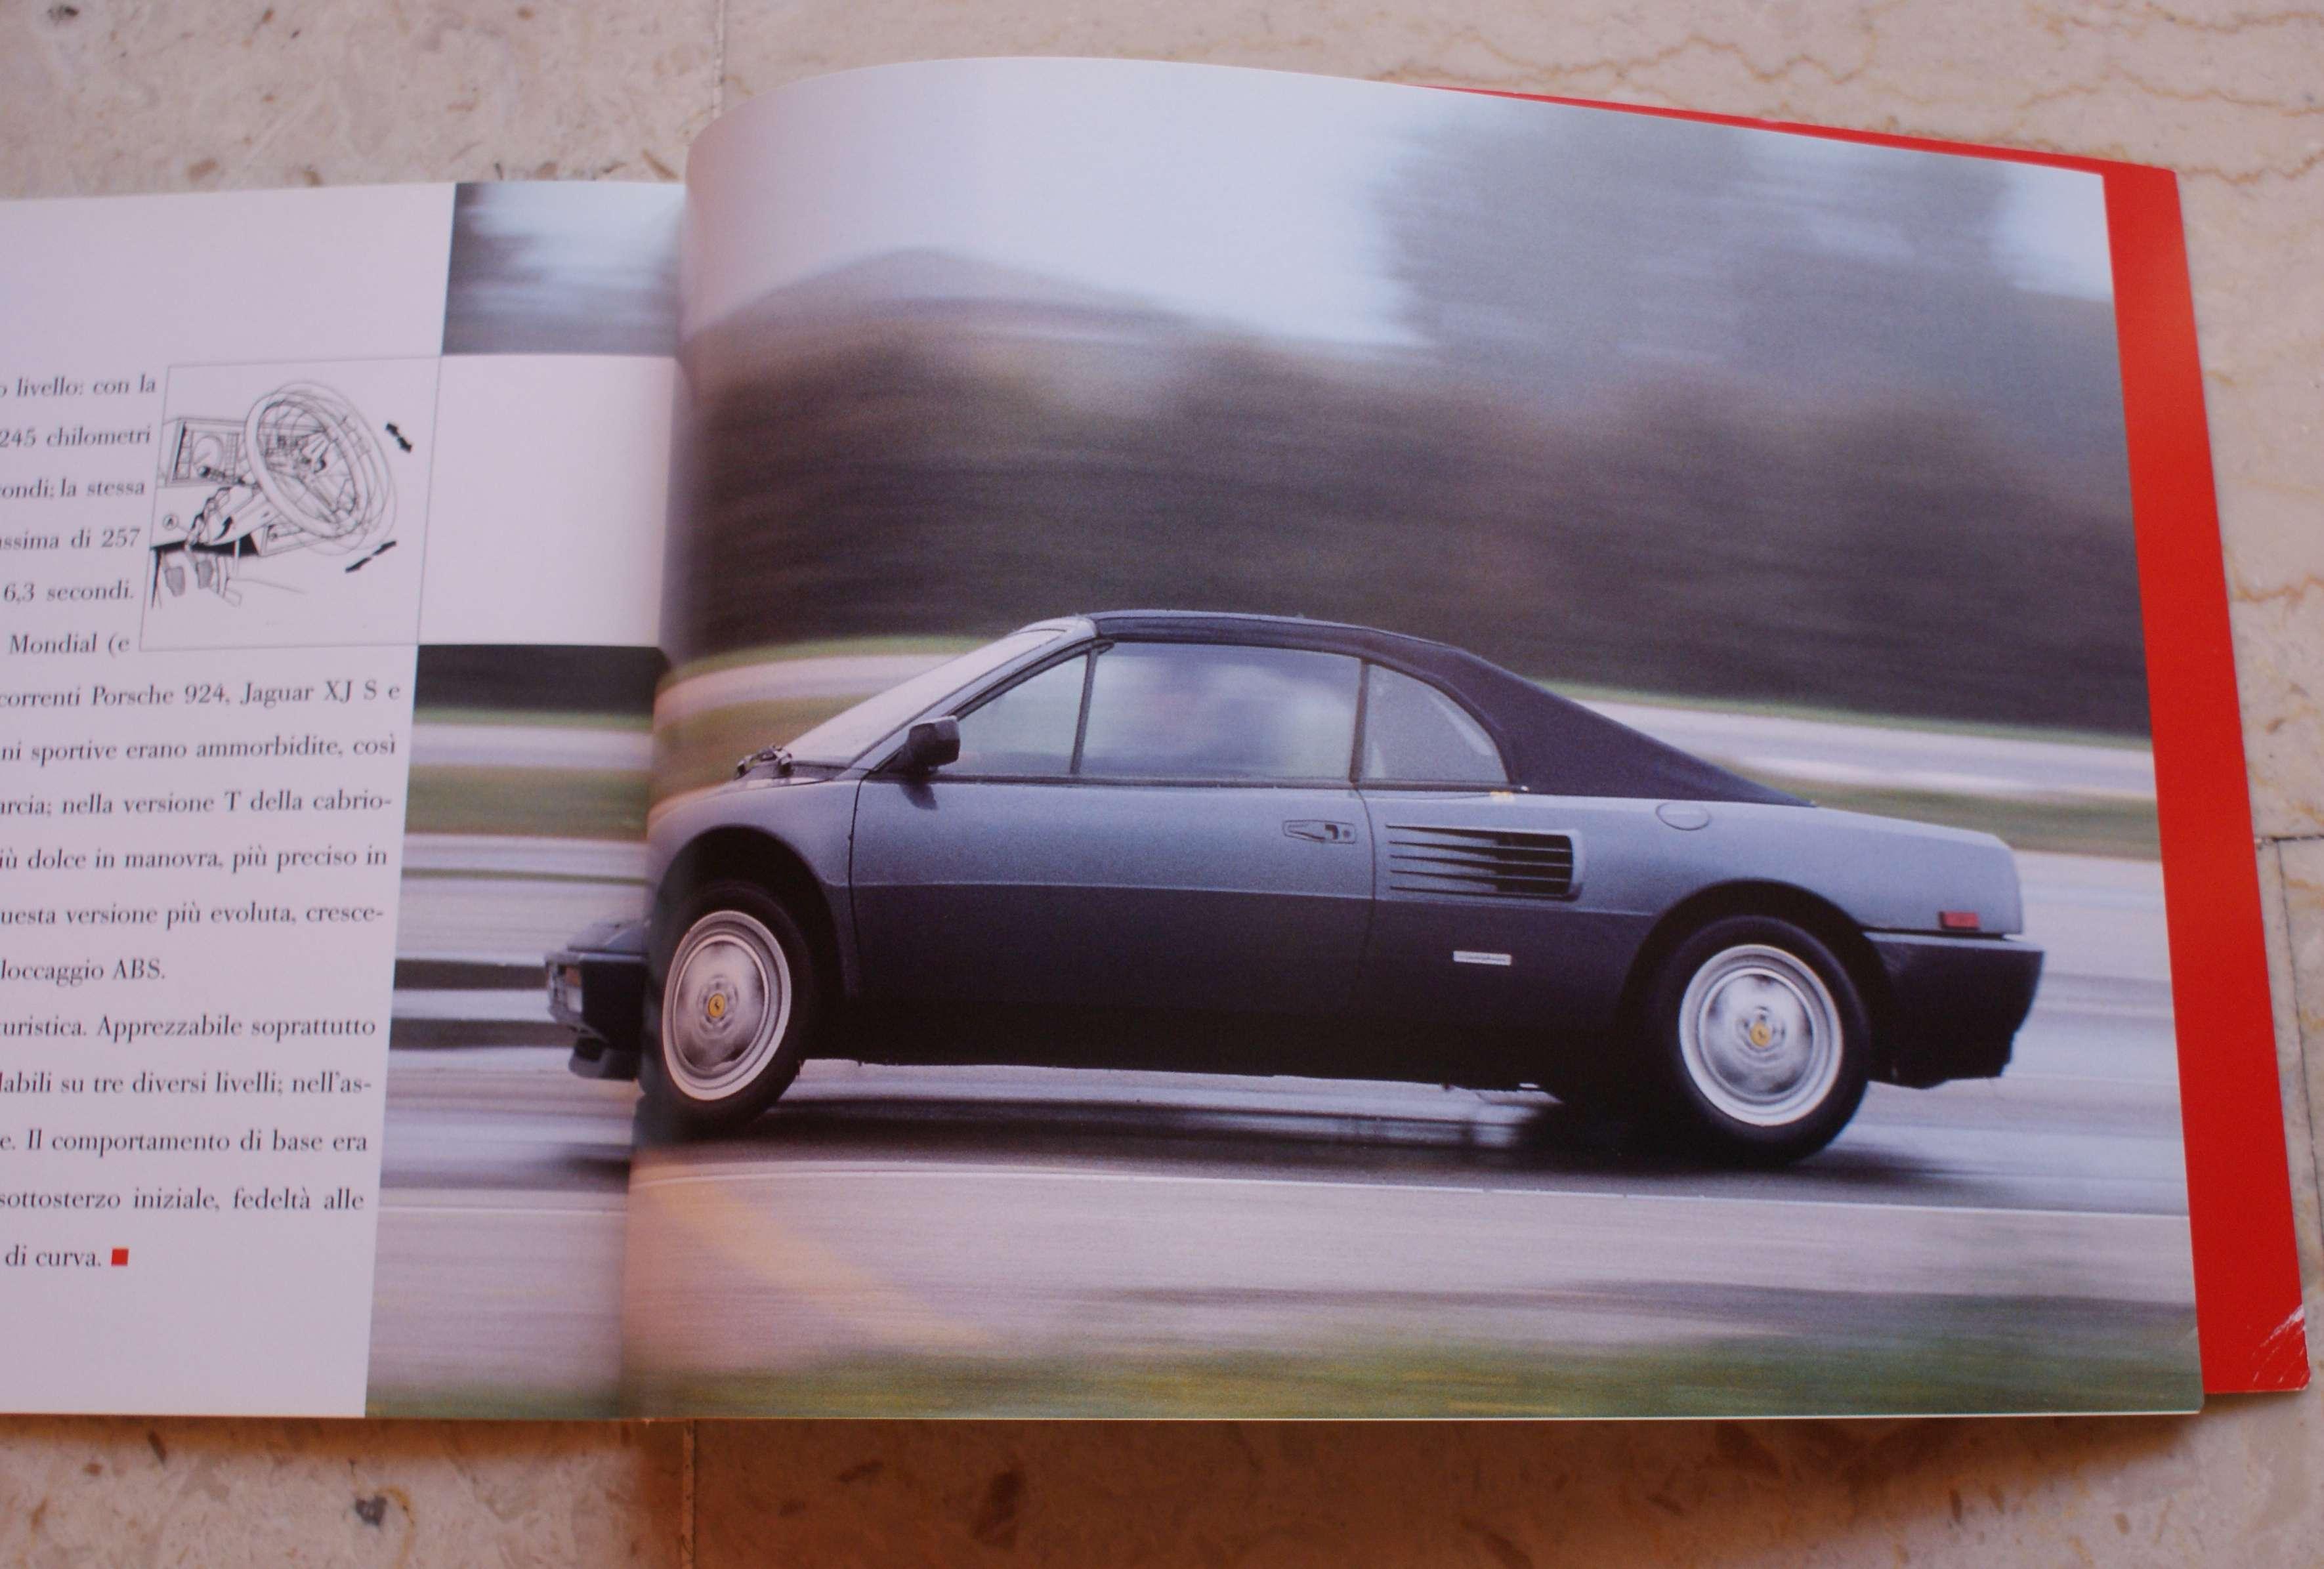 4hKE25 Terrific Ferrari Mondial Cabrio In Vendita Cars Trend